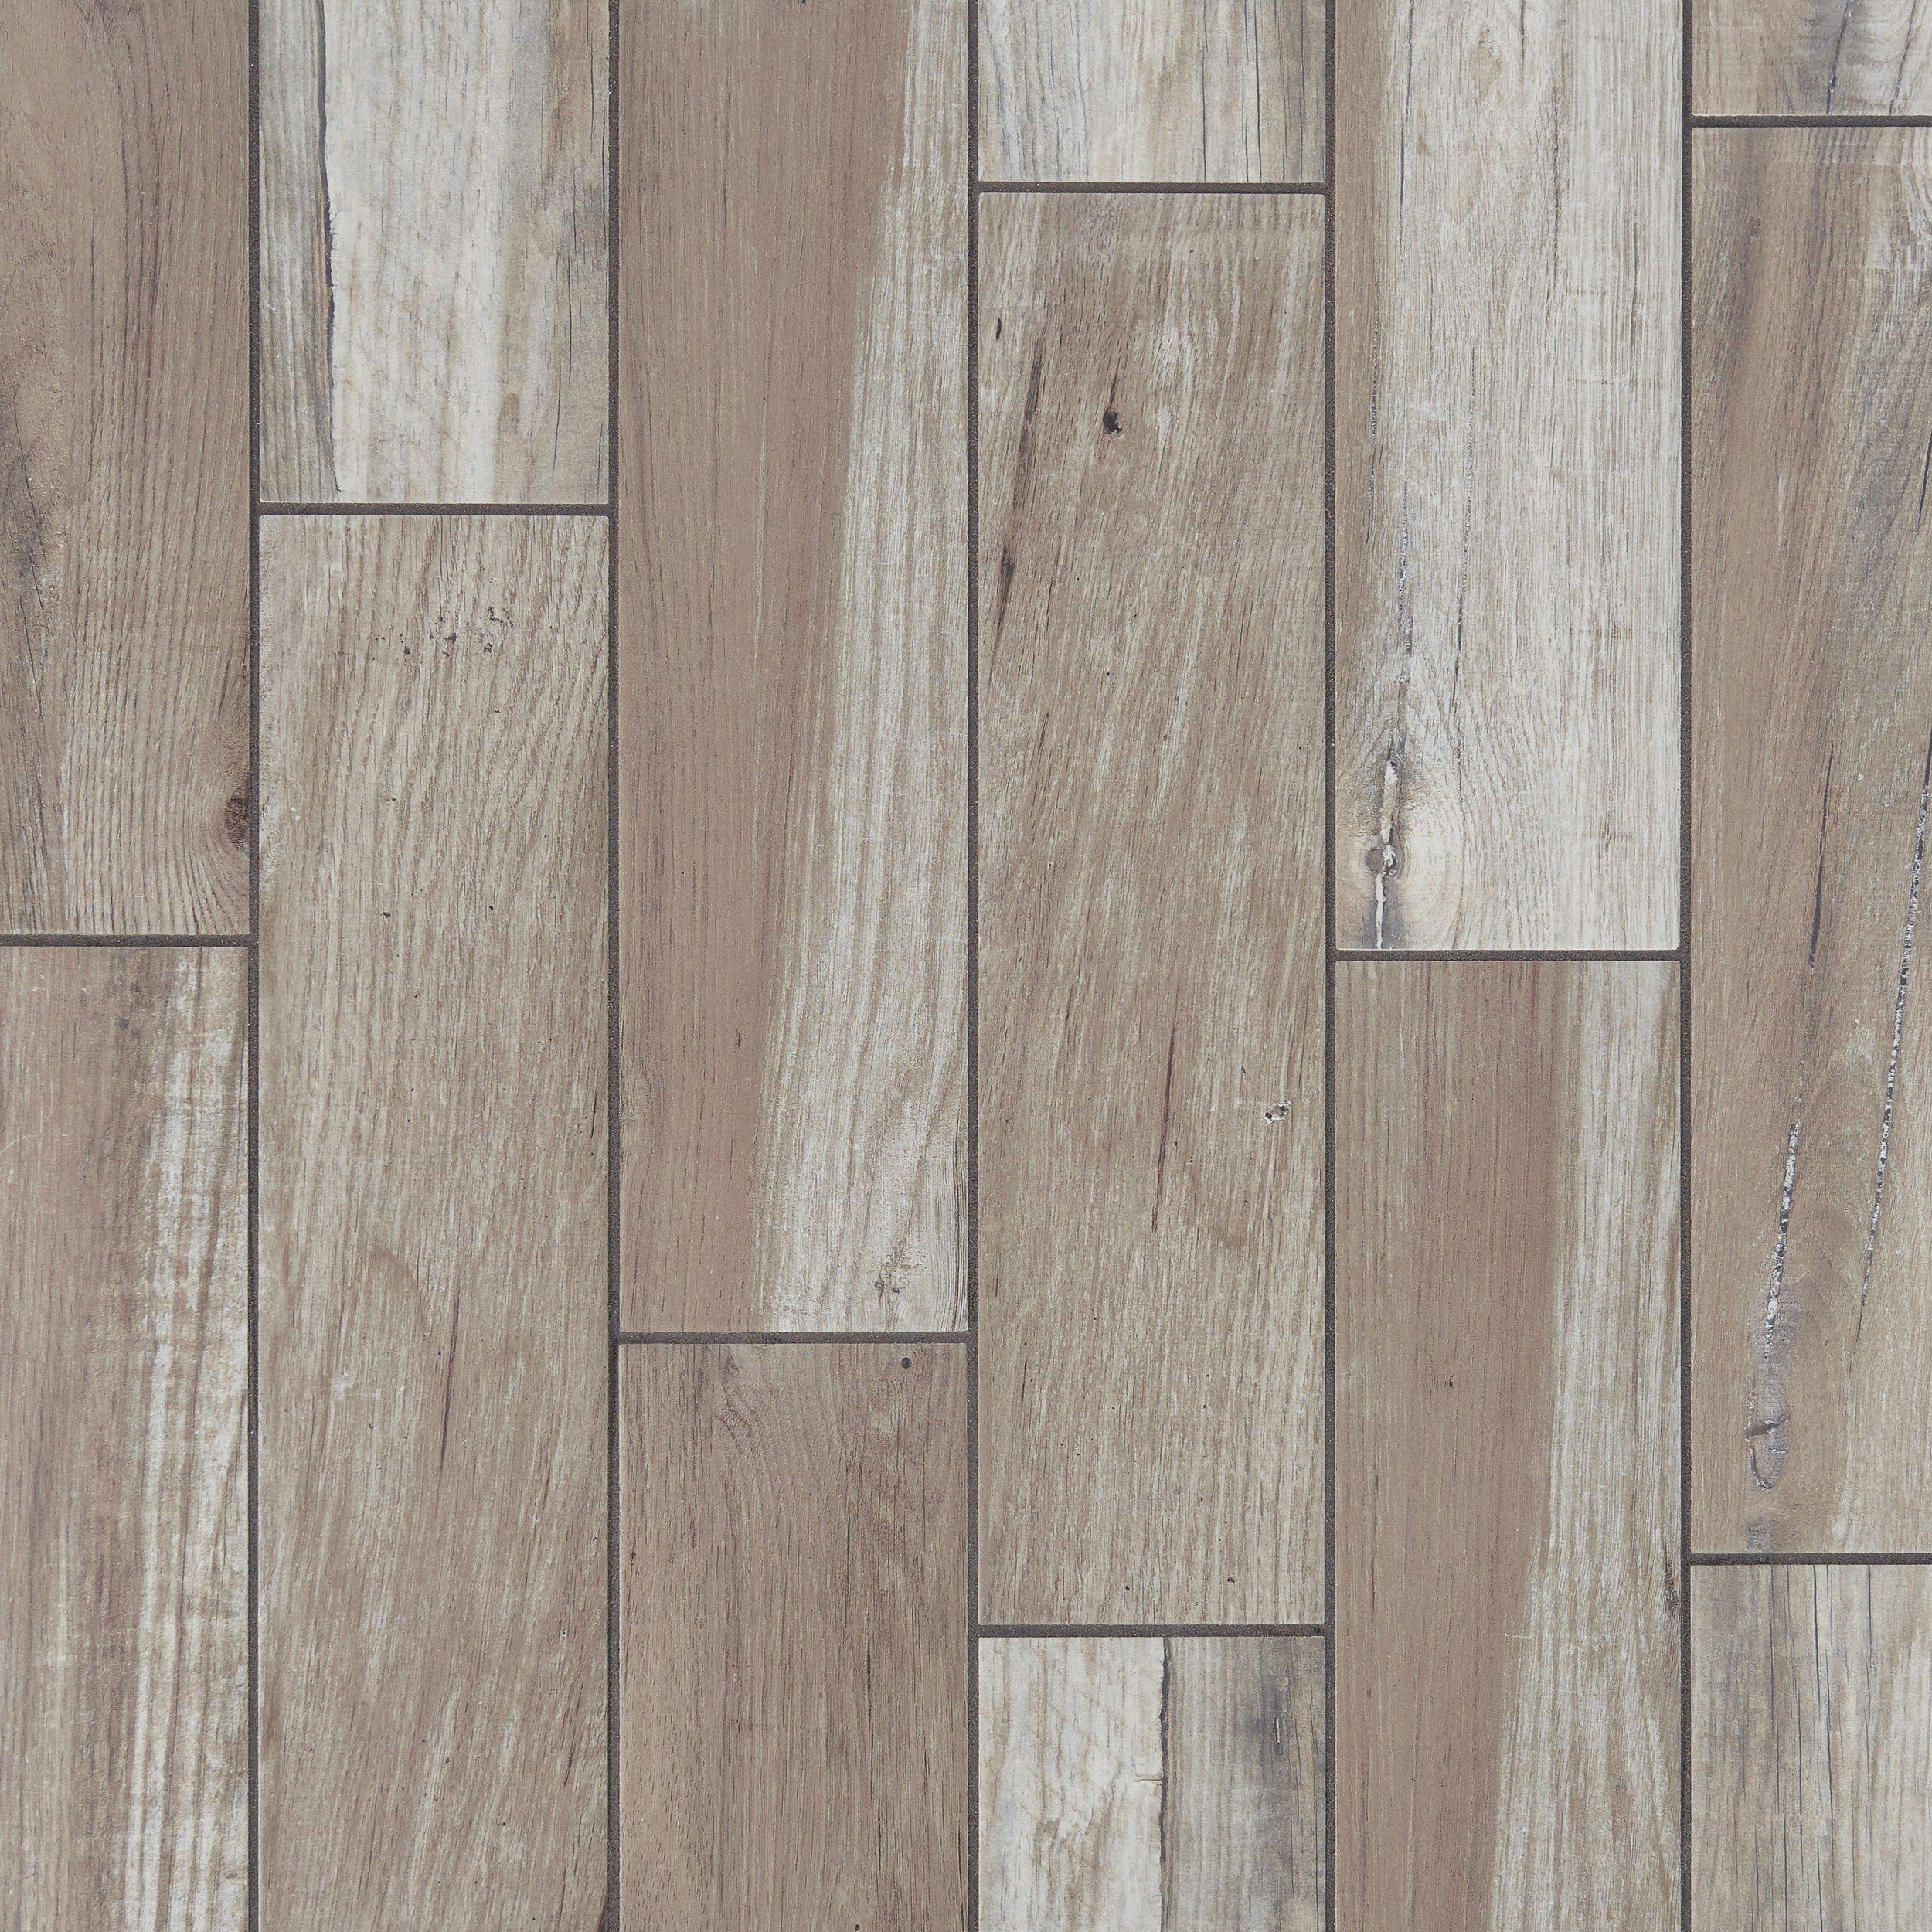 Wood look tile floor decor tahoe silver wood plank porcelain tile dailygadgetfo Gallery